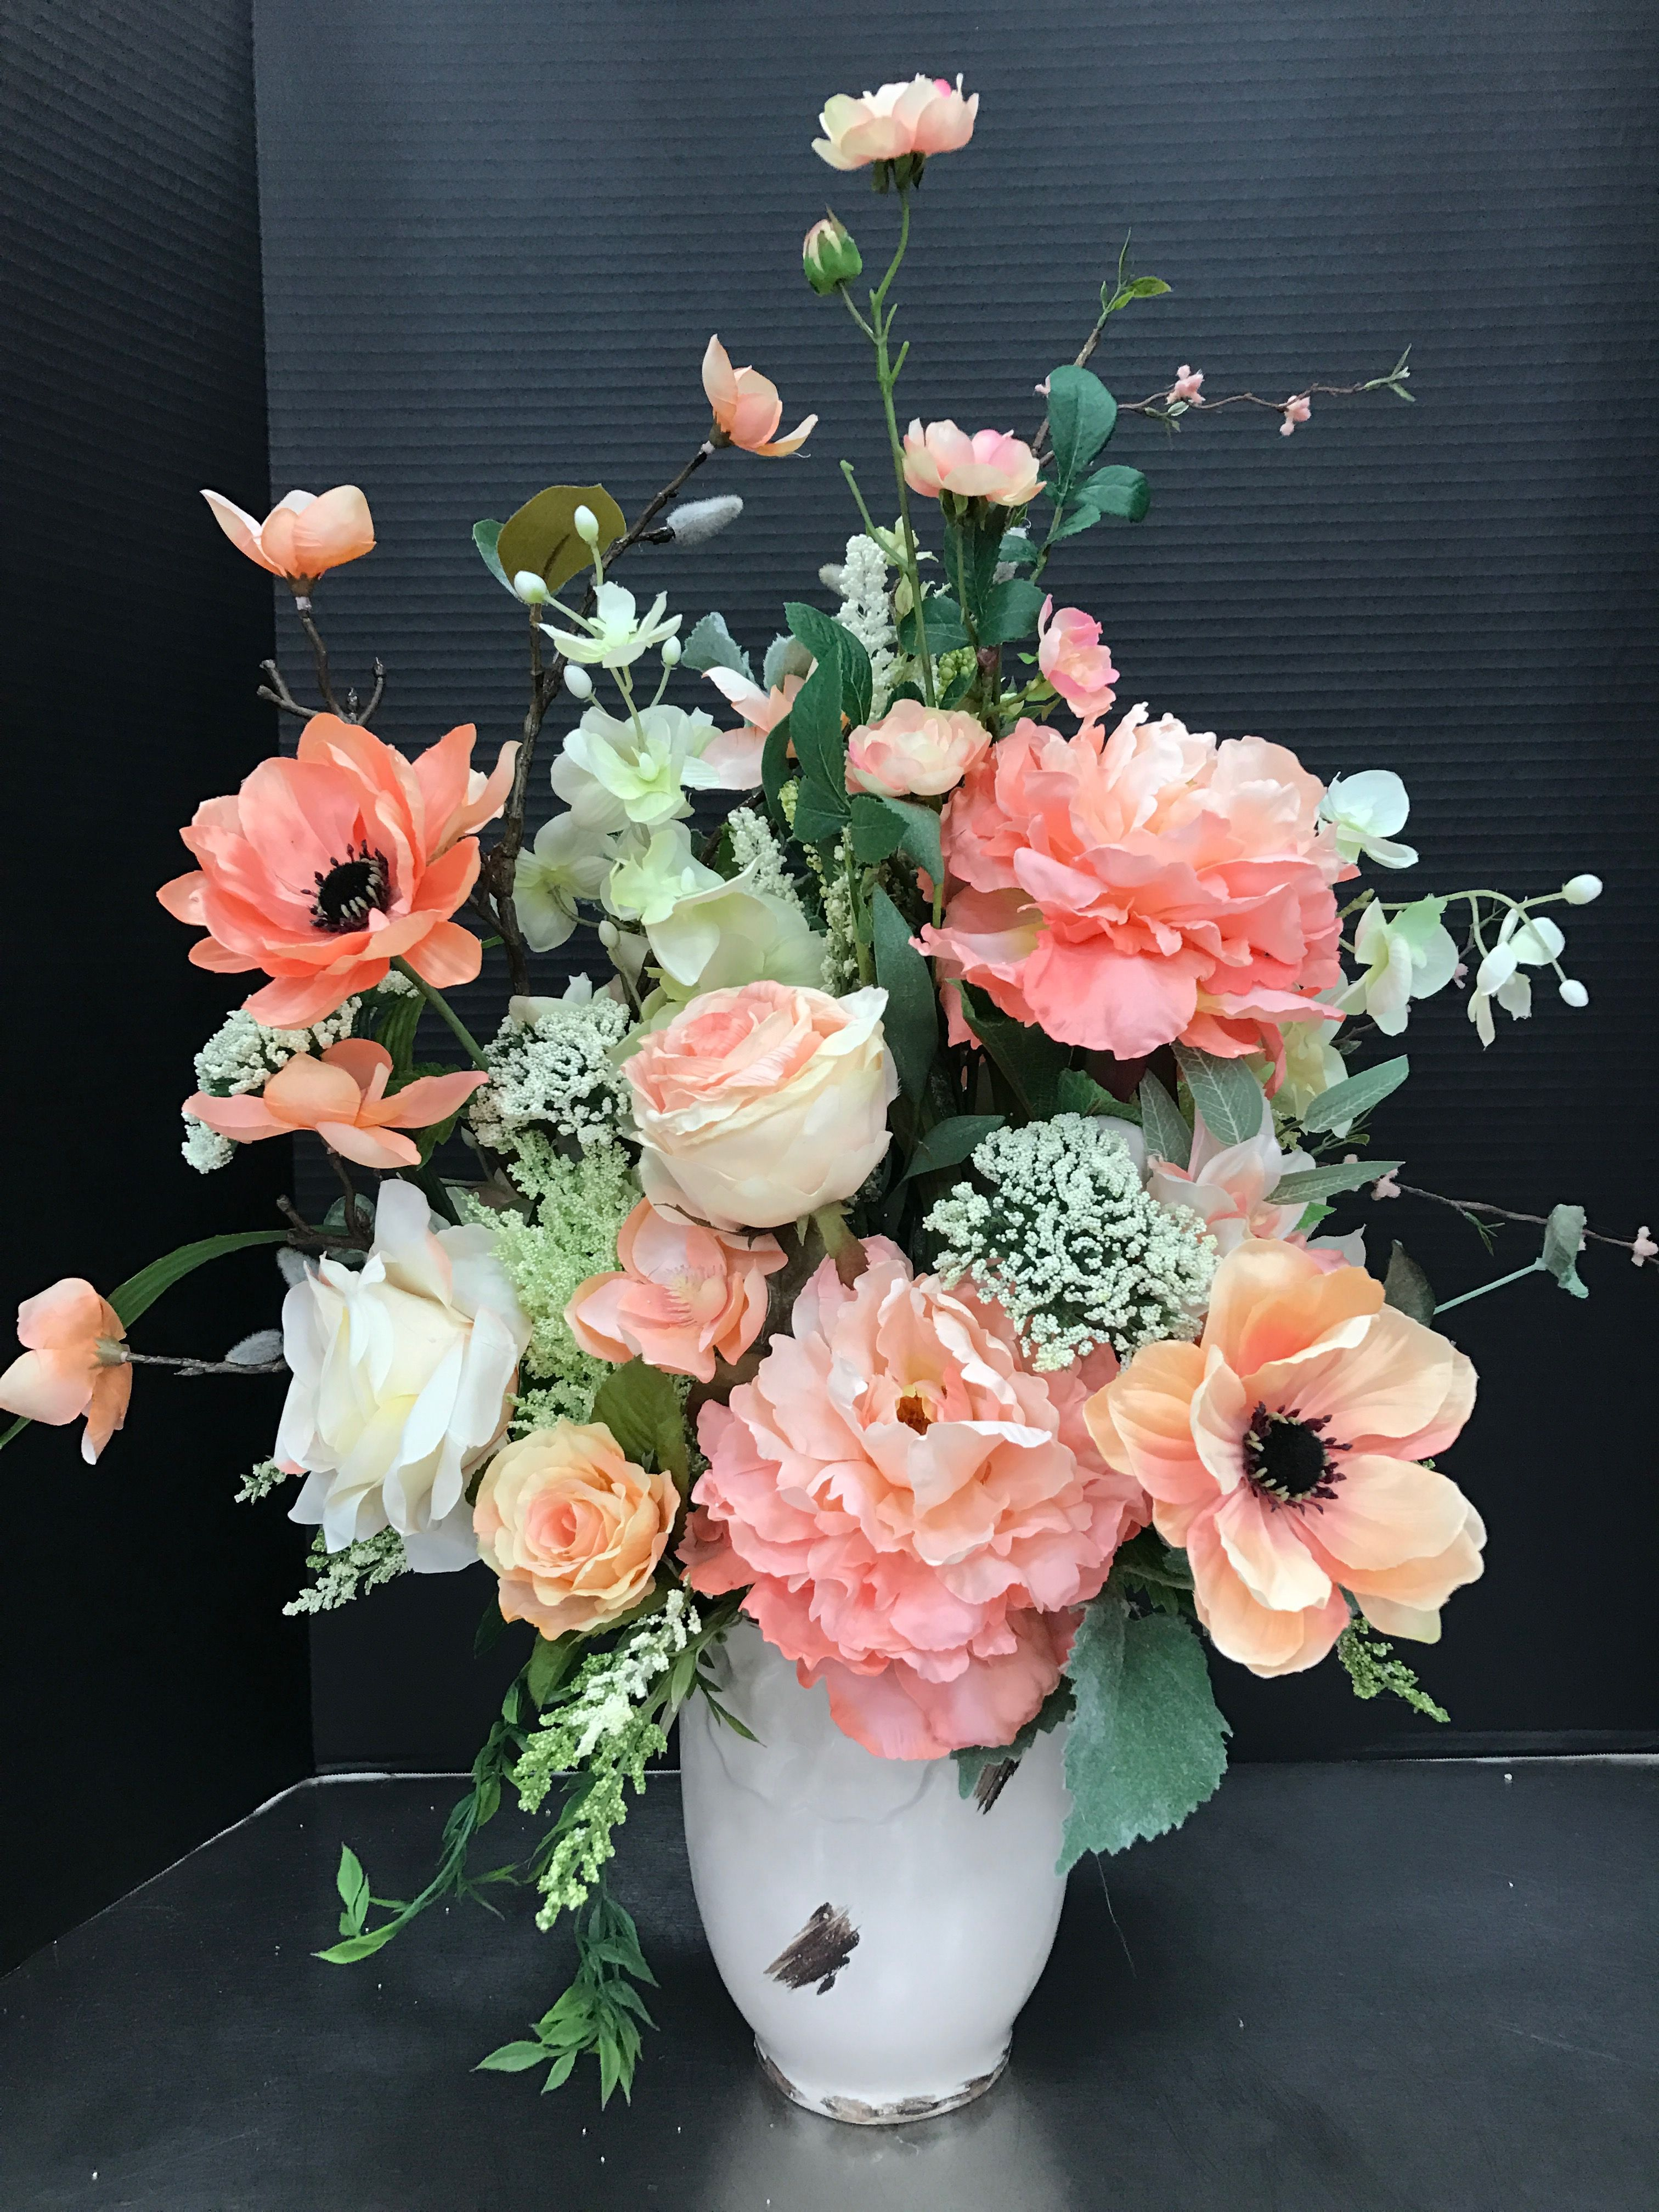 Spring Floral Arranging Tips with Alice's Table ... |Large Spring Floral Arrangements